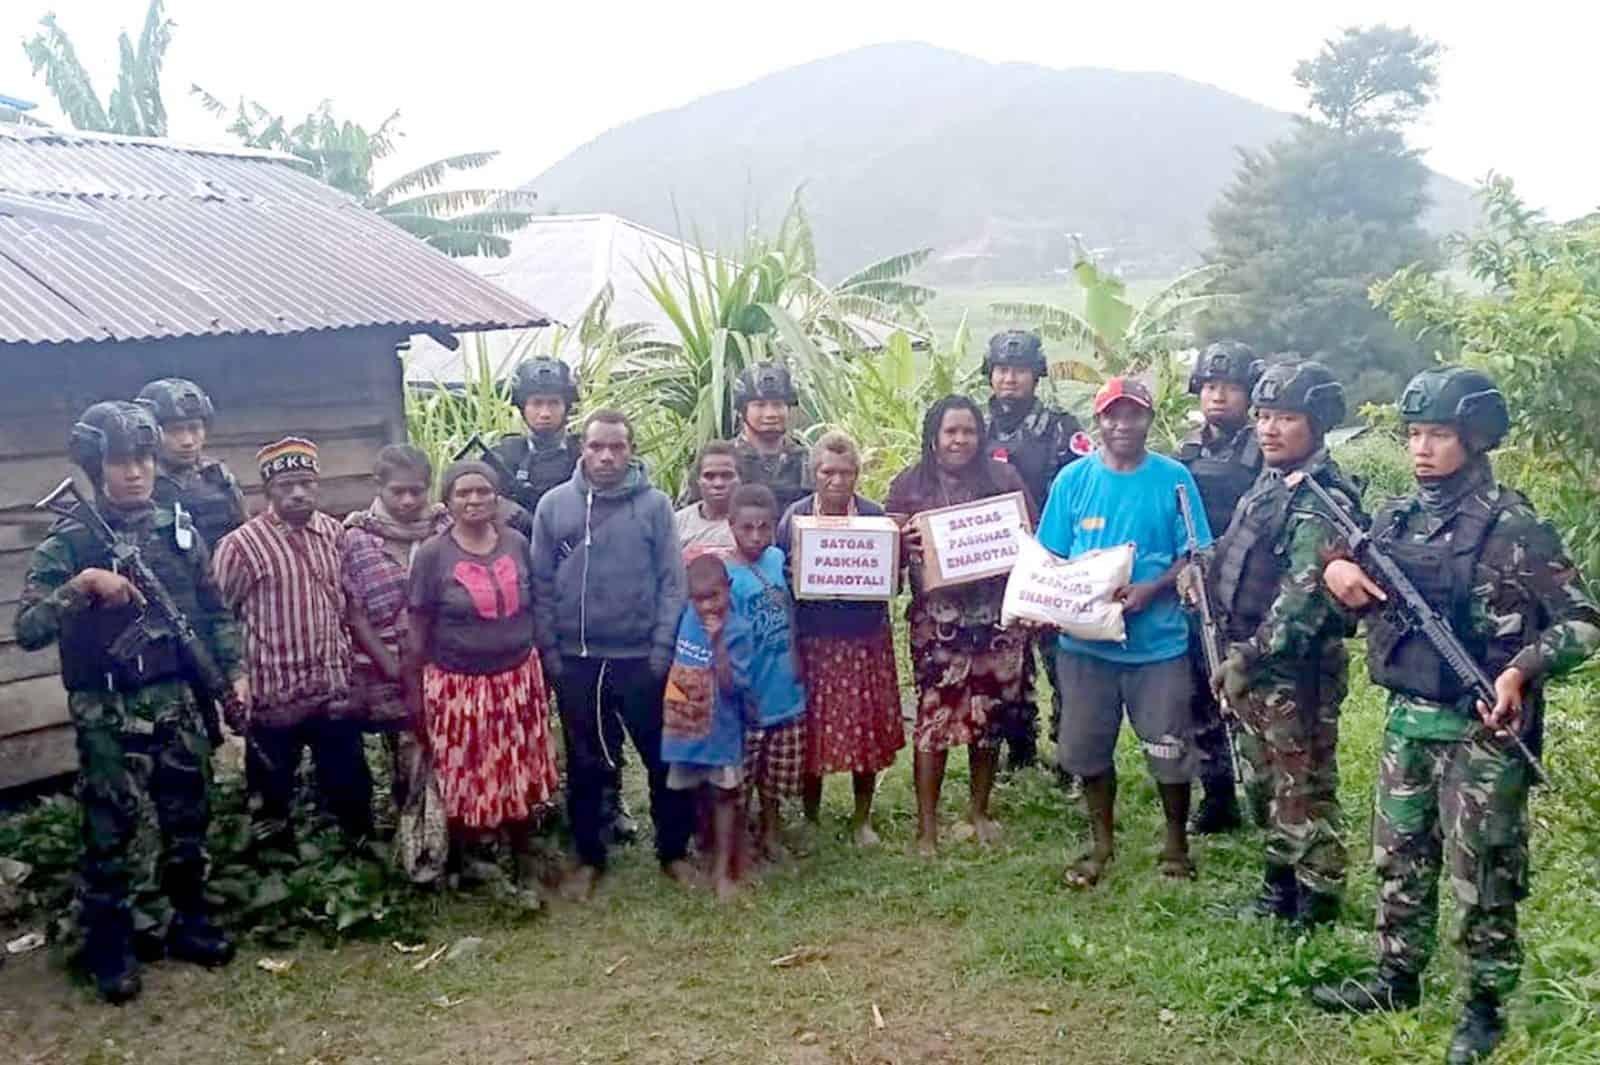 Satgas Pamrahwan Yonko 462 Paskhas Pos Enarotali Laksanakan Patroli Keamanan Dan Bhakti Sosial